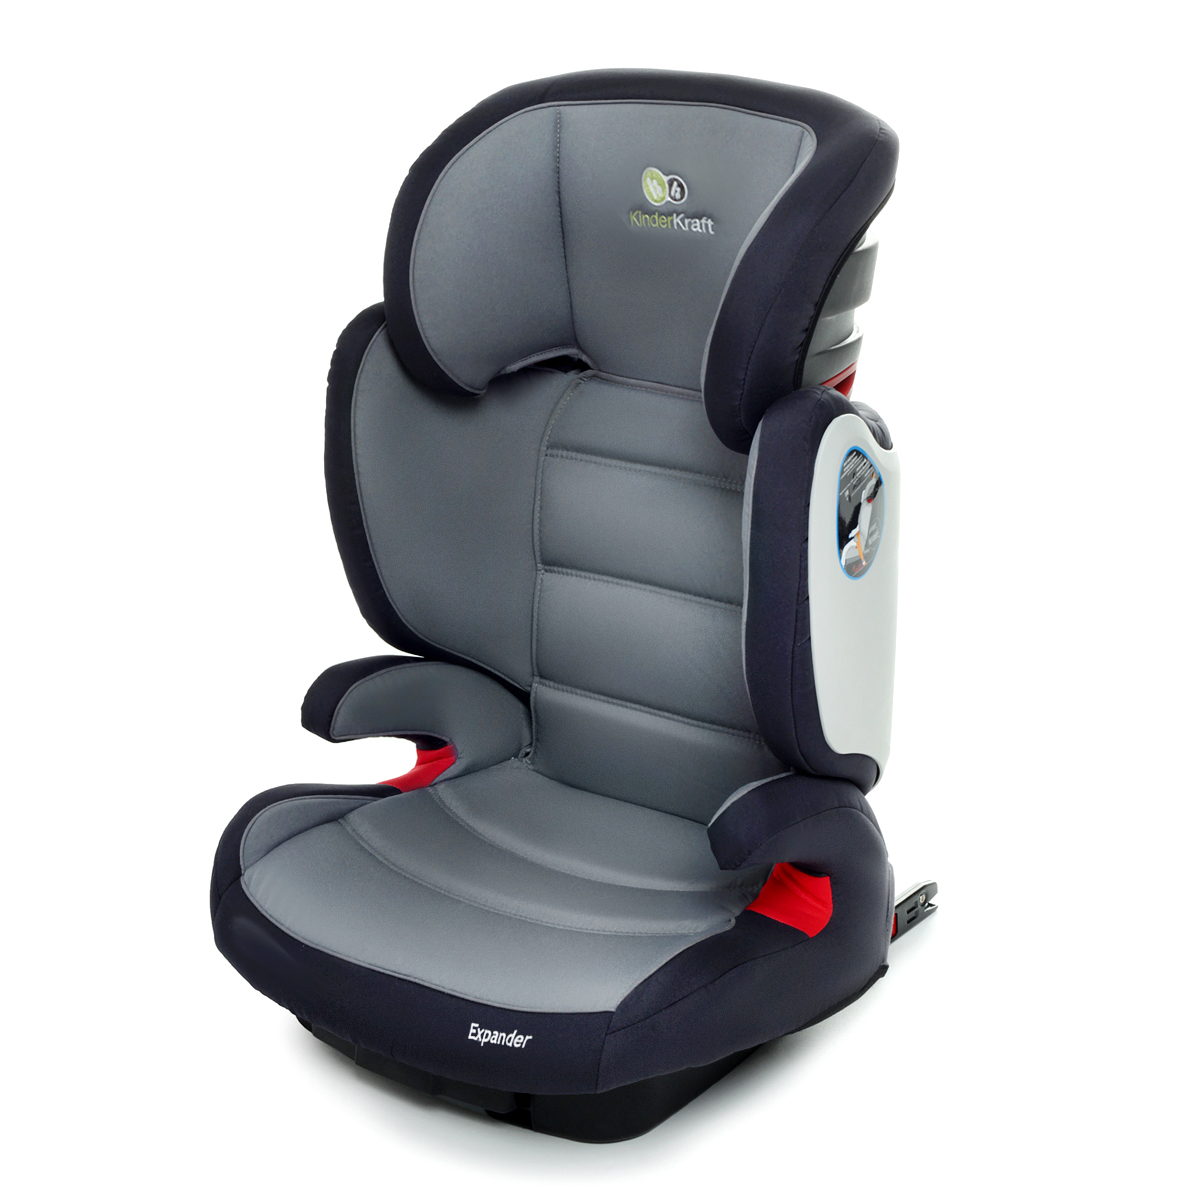 isofix kindersitz 15 bis 36 kg gruppe 2 3 kinderautositz autositz expander grau ebay. Black Bedroom Furniture Sets. Home Design Ideas